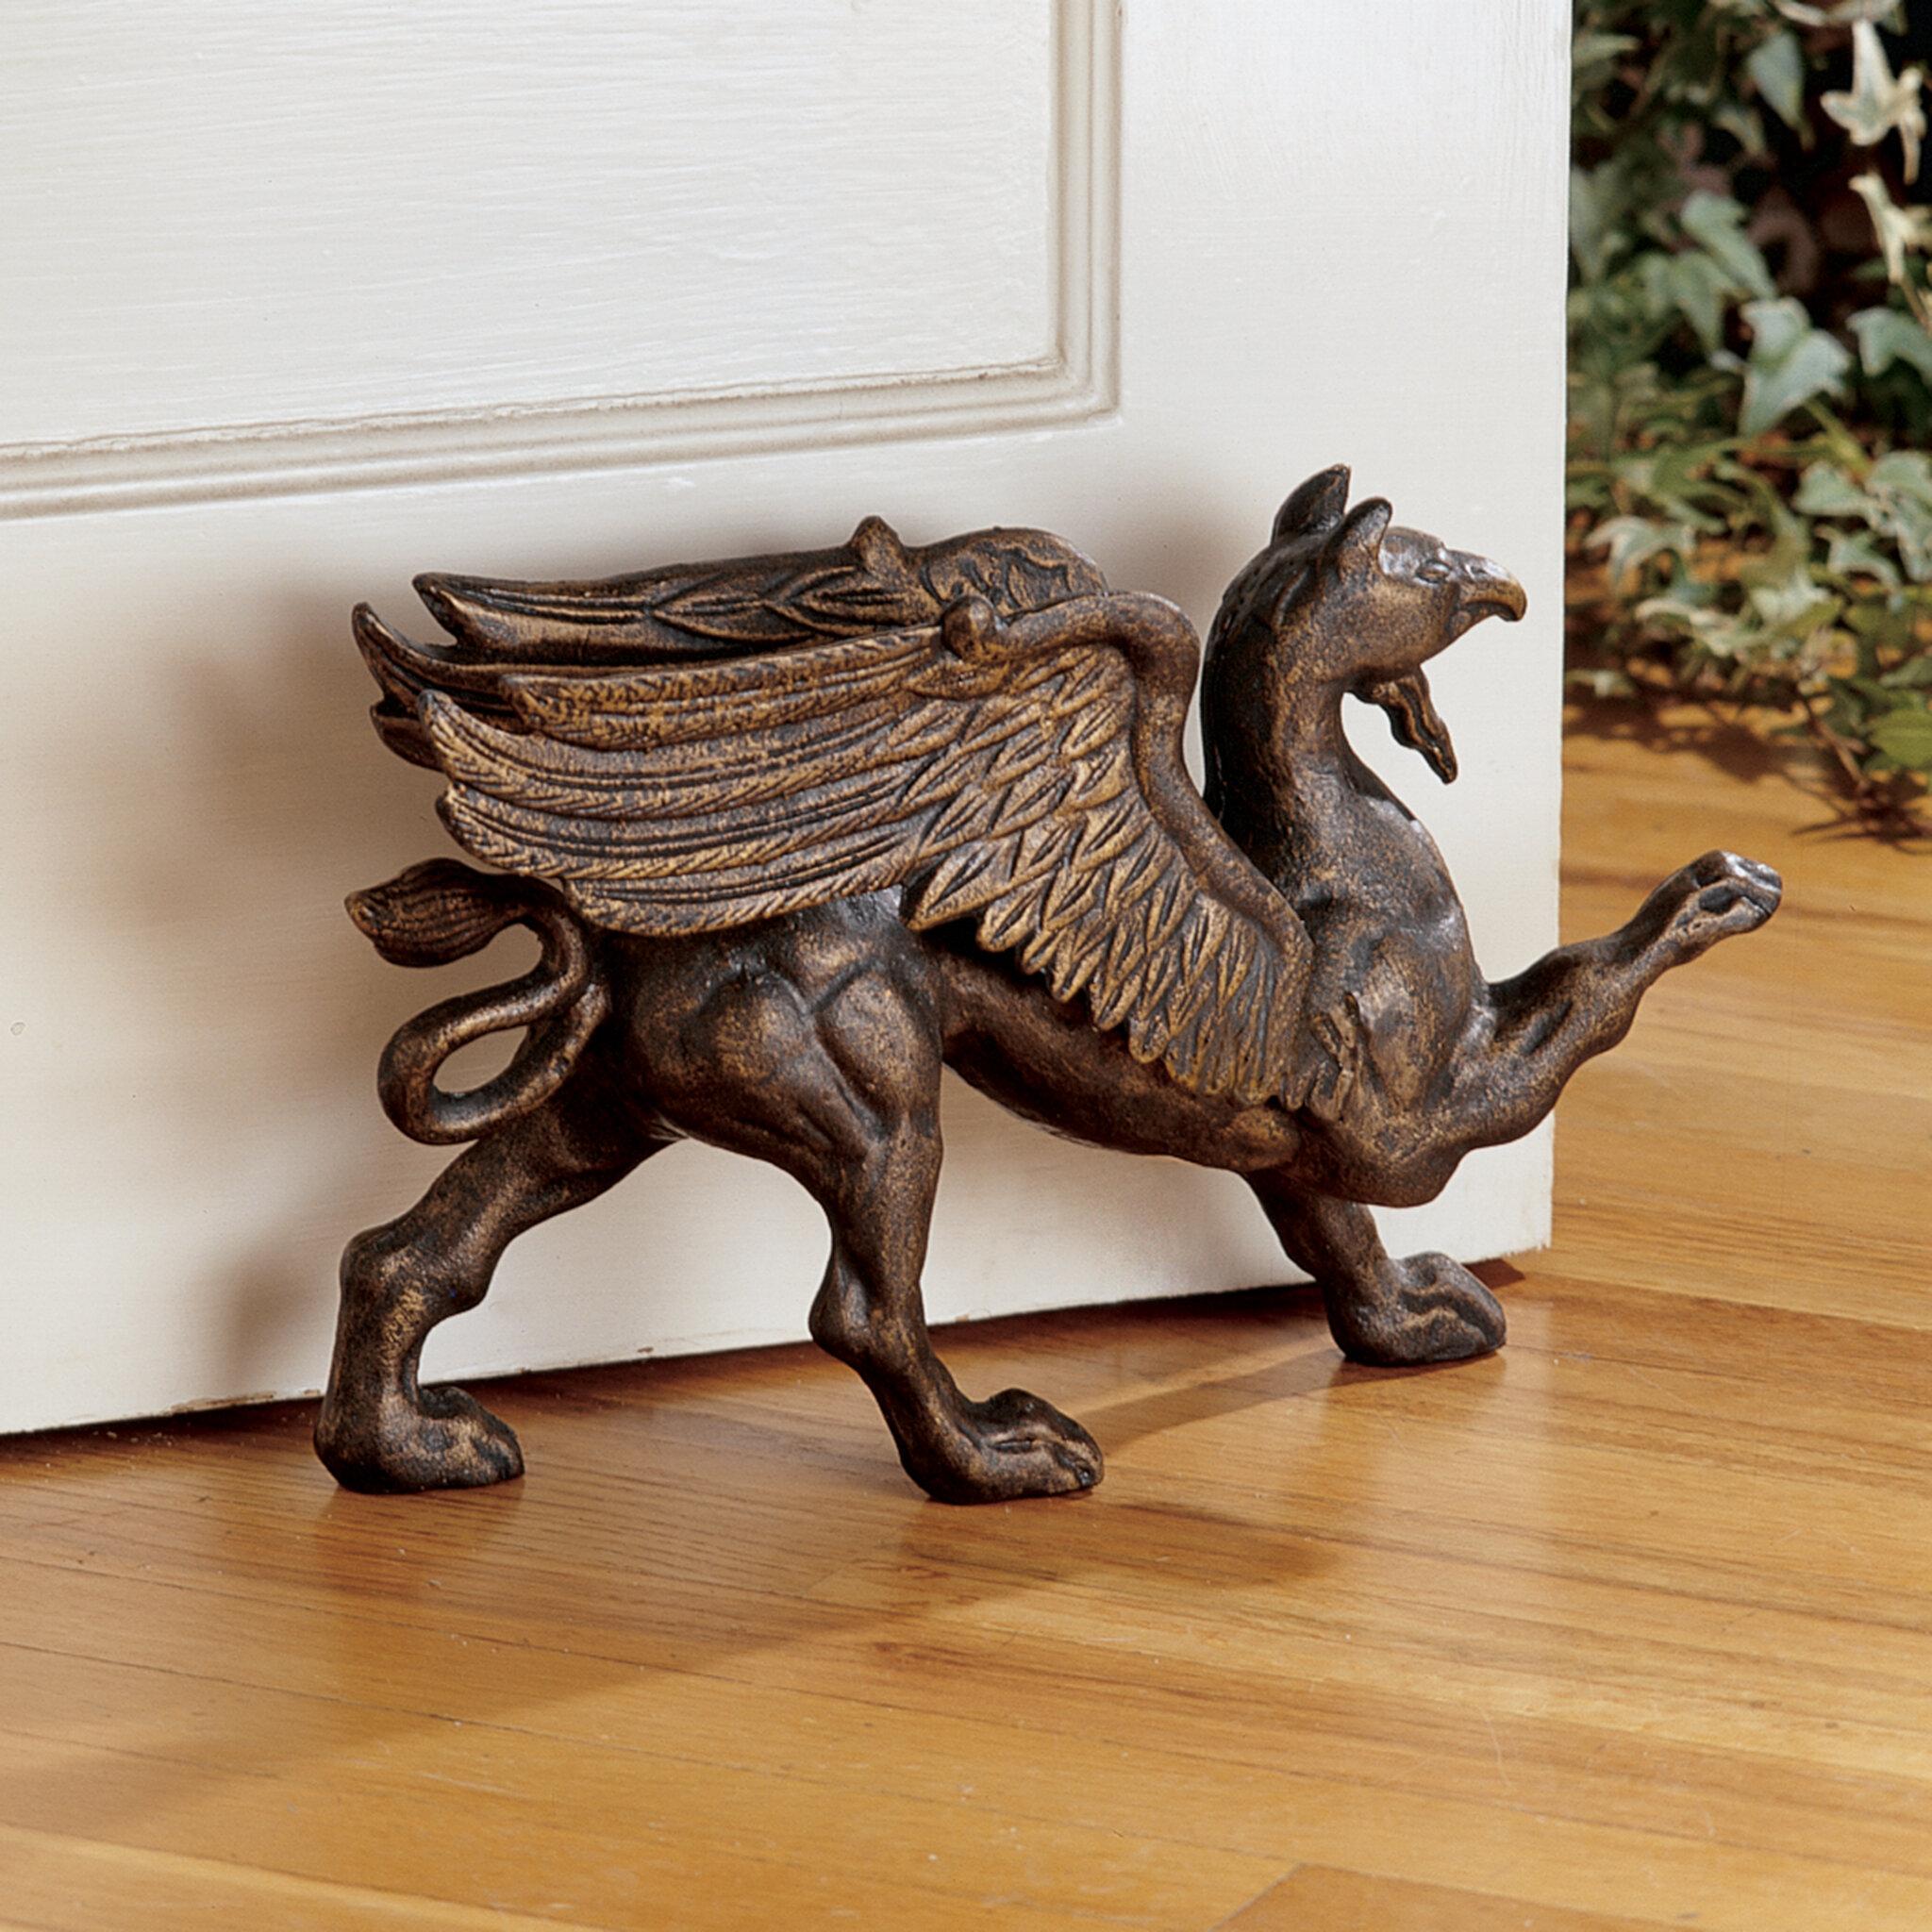 Design Toscano The Growling Griffin Foundry Doorstop Figurine Reviews Wayfair